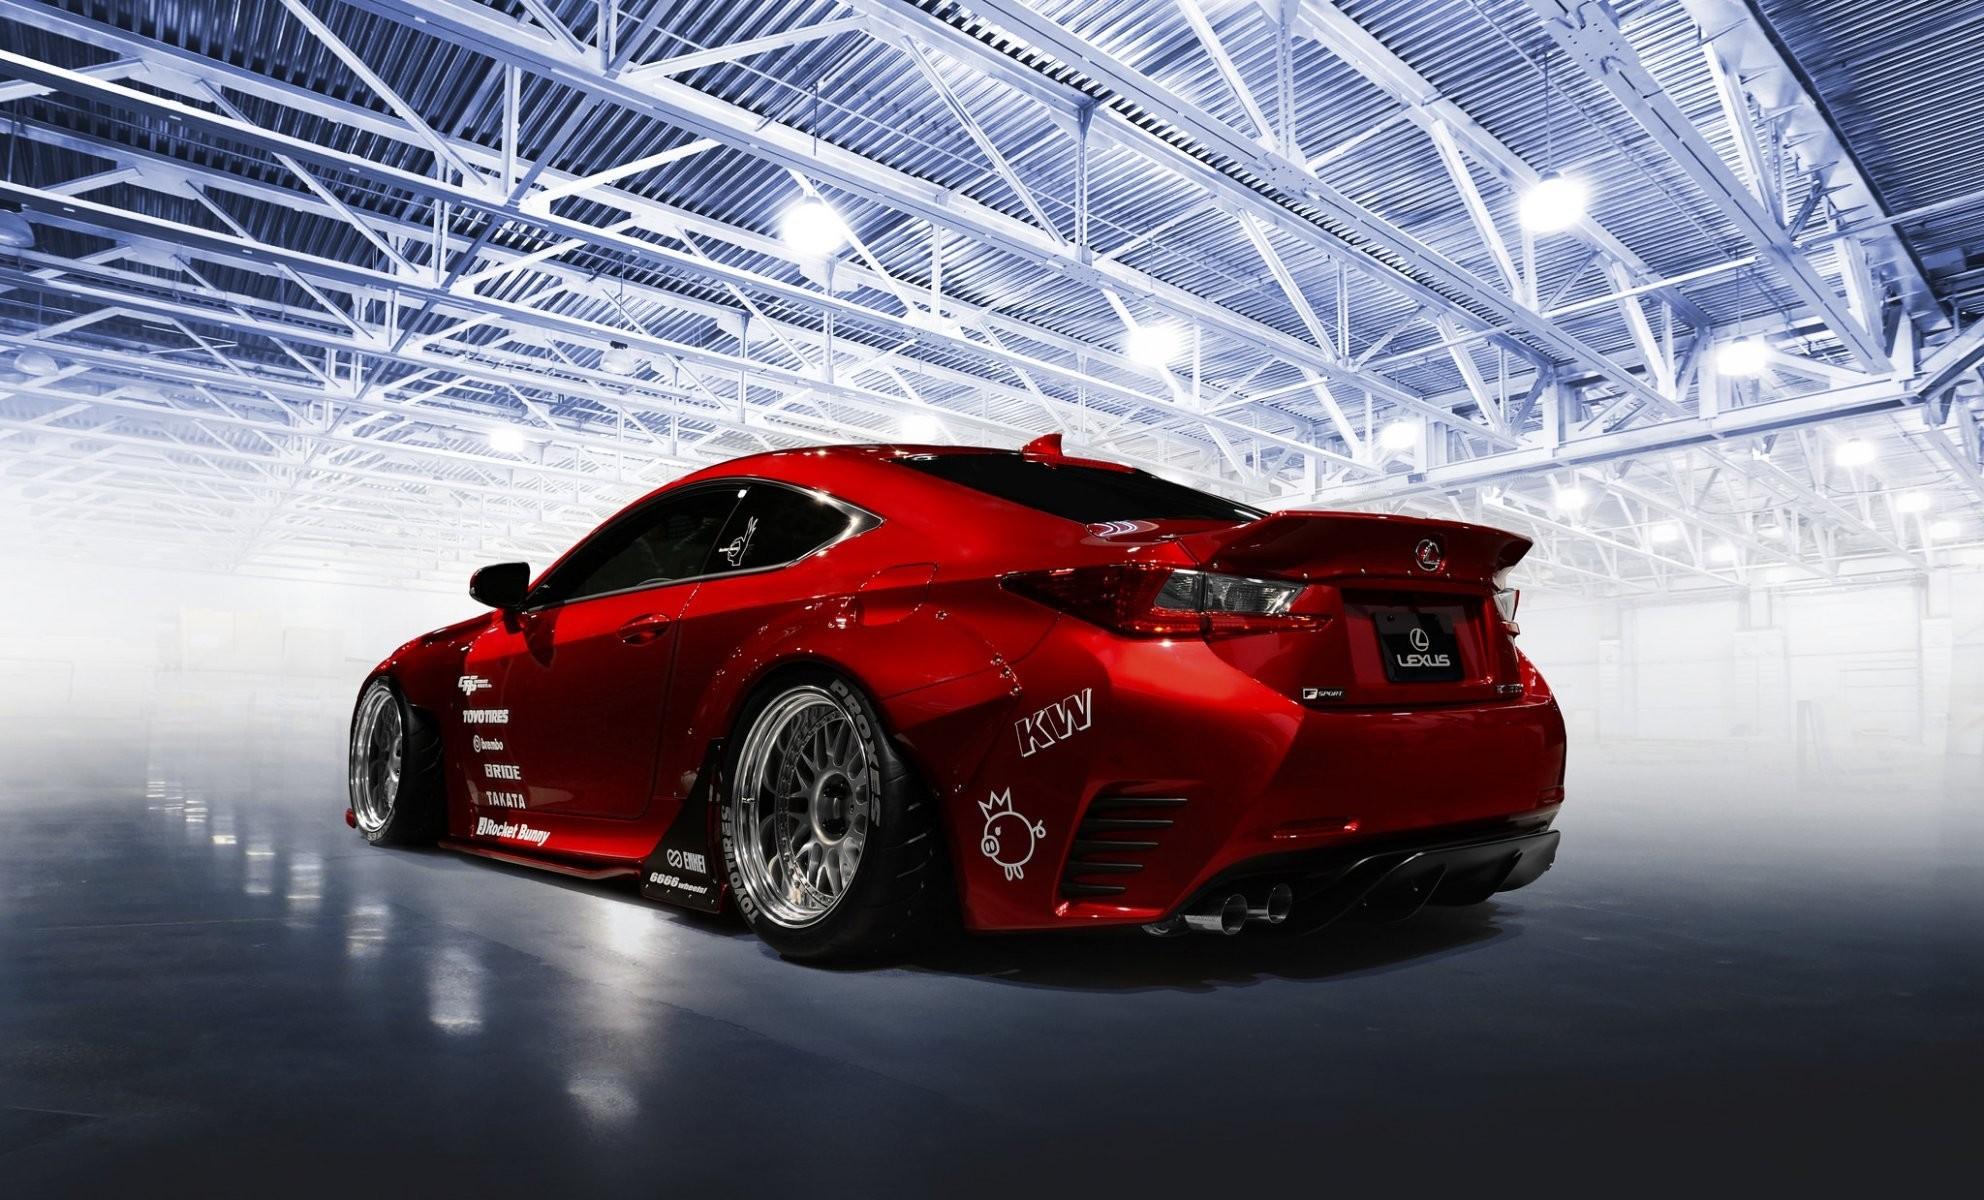 lexus rc-f tuning rocket bunny red car